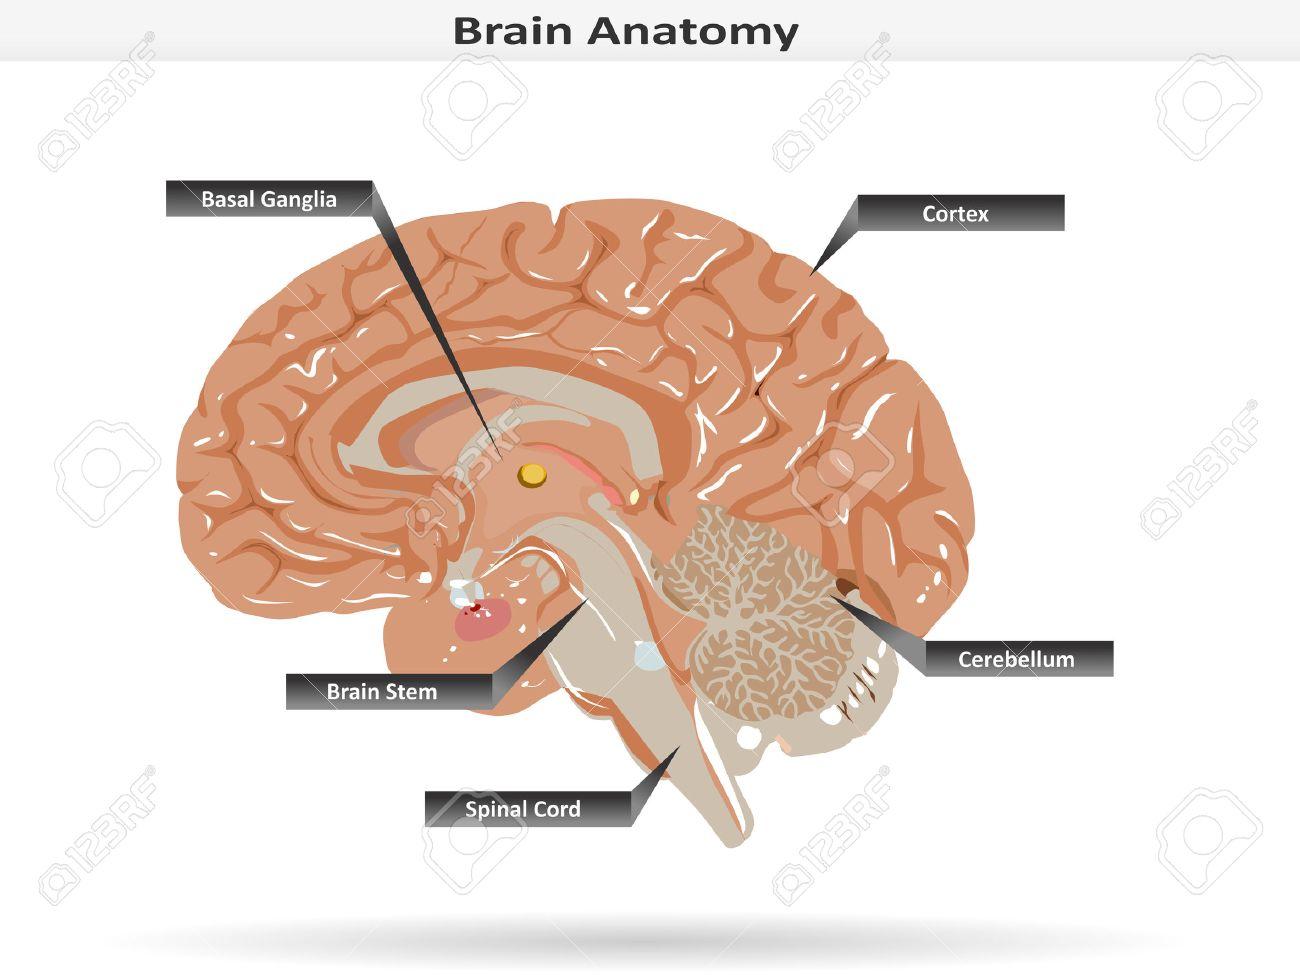 hight resolution of brain anatomy with basal ganglia cortex brain stem cerebellum and spinal cord stock